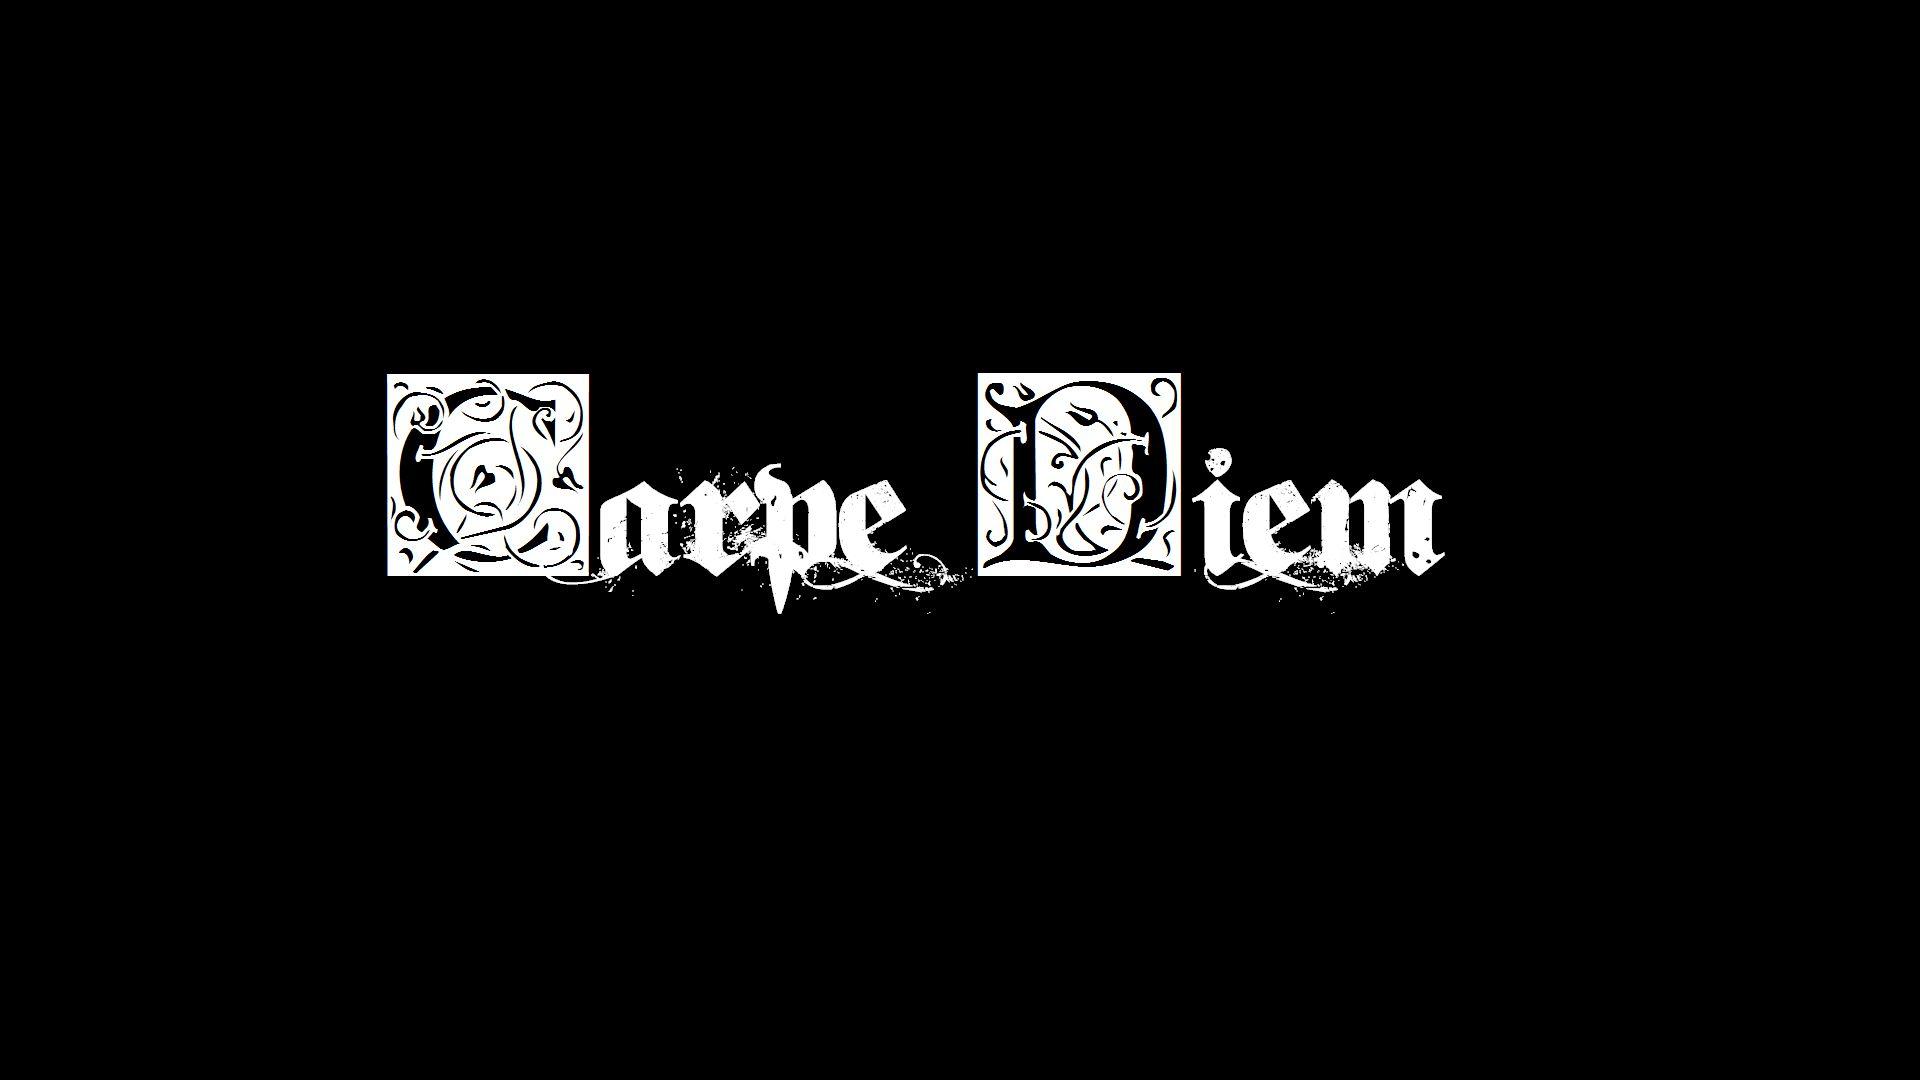 Carpe Diem wallpaper for computer